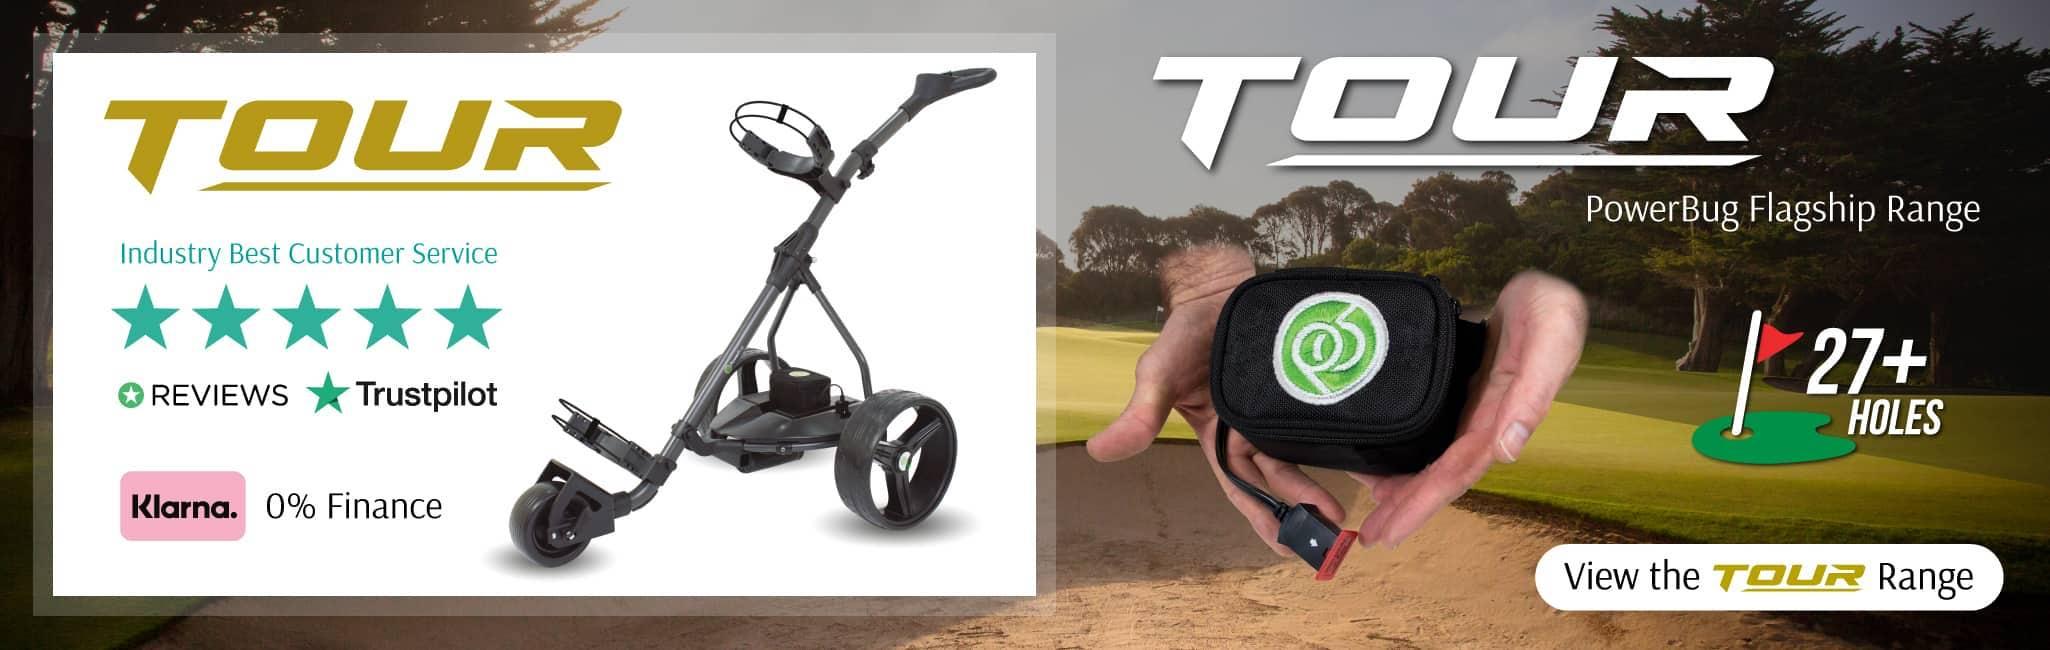 PowerBug Tour Series Trolleys